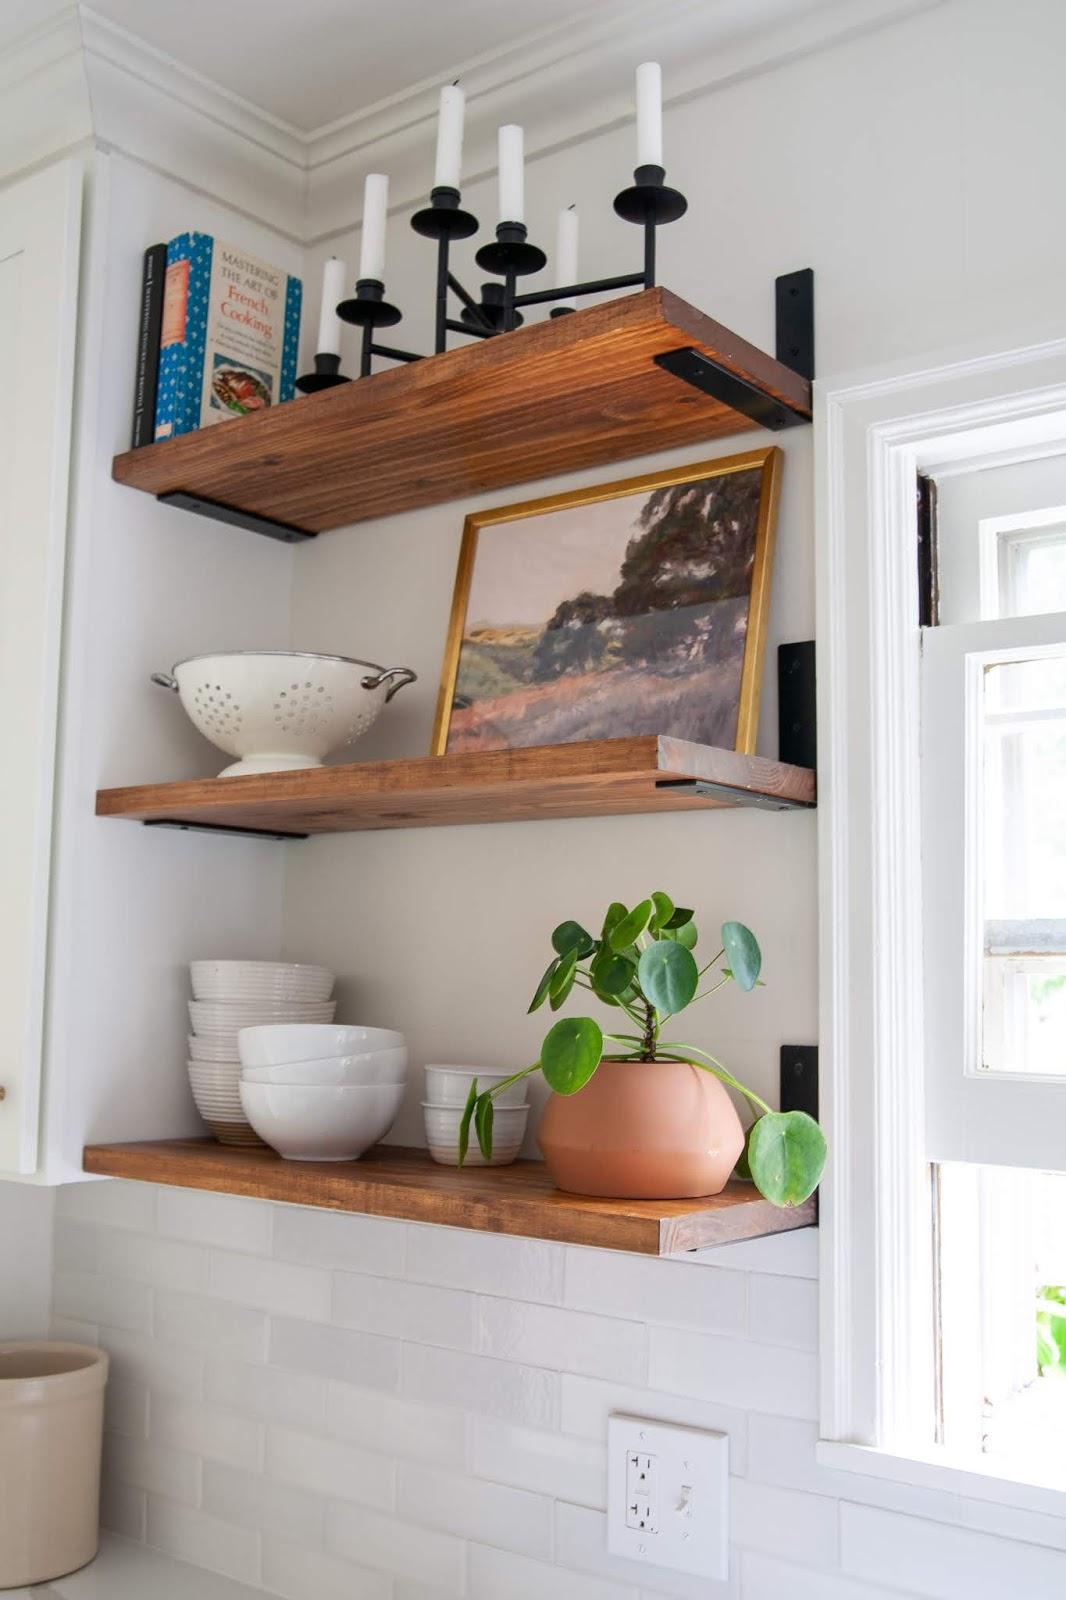 Diy Budget Friendly Floating Look Open Shelves Create Enjoy